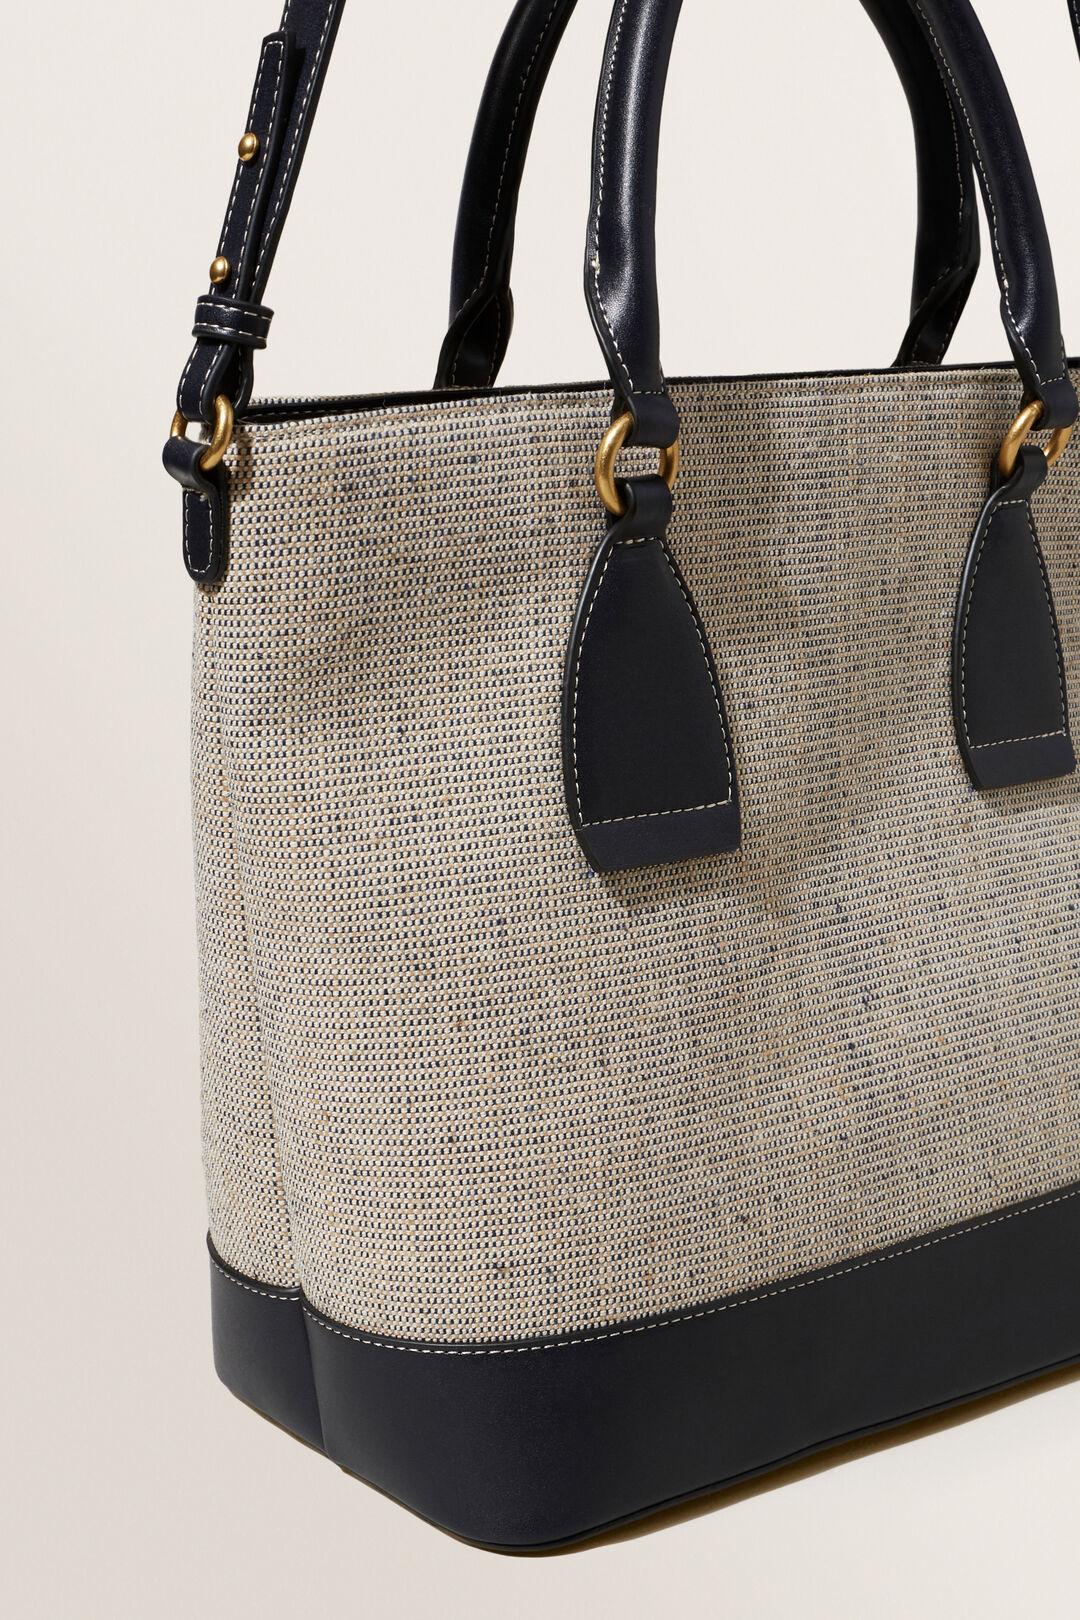 Textured Fabric Tote  DEEP NAVY  hi-res